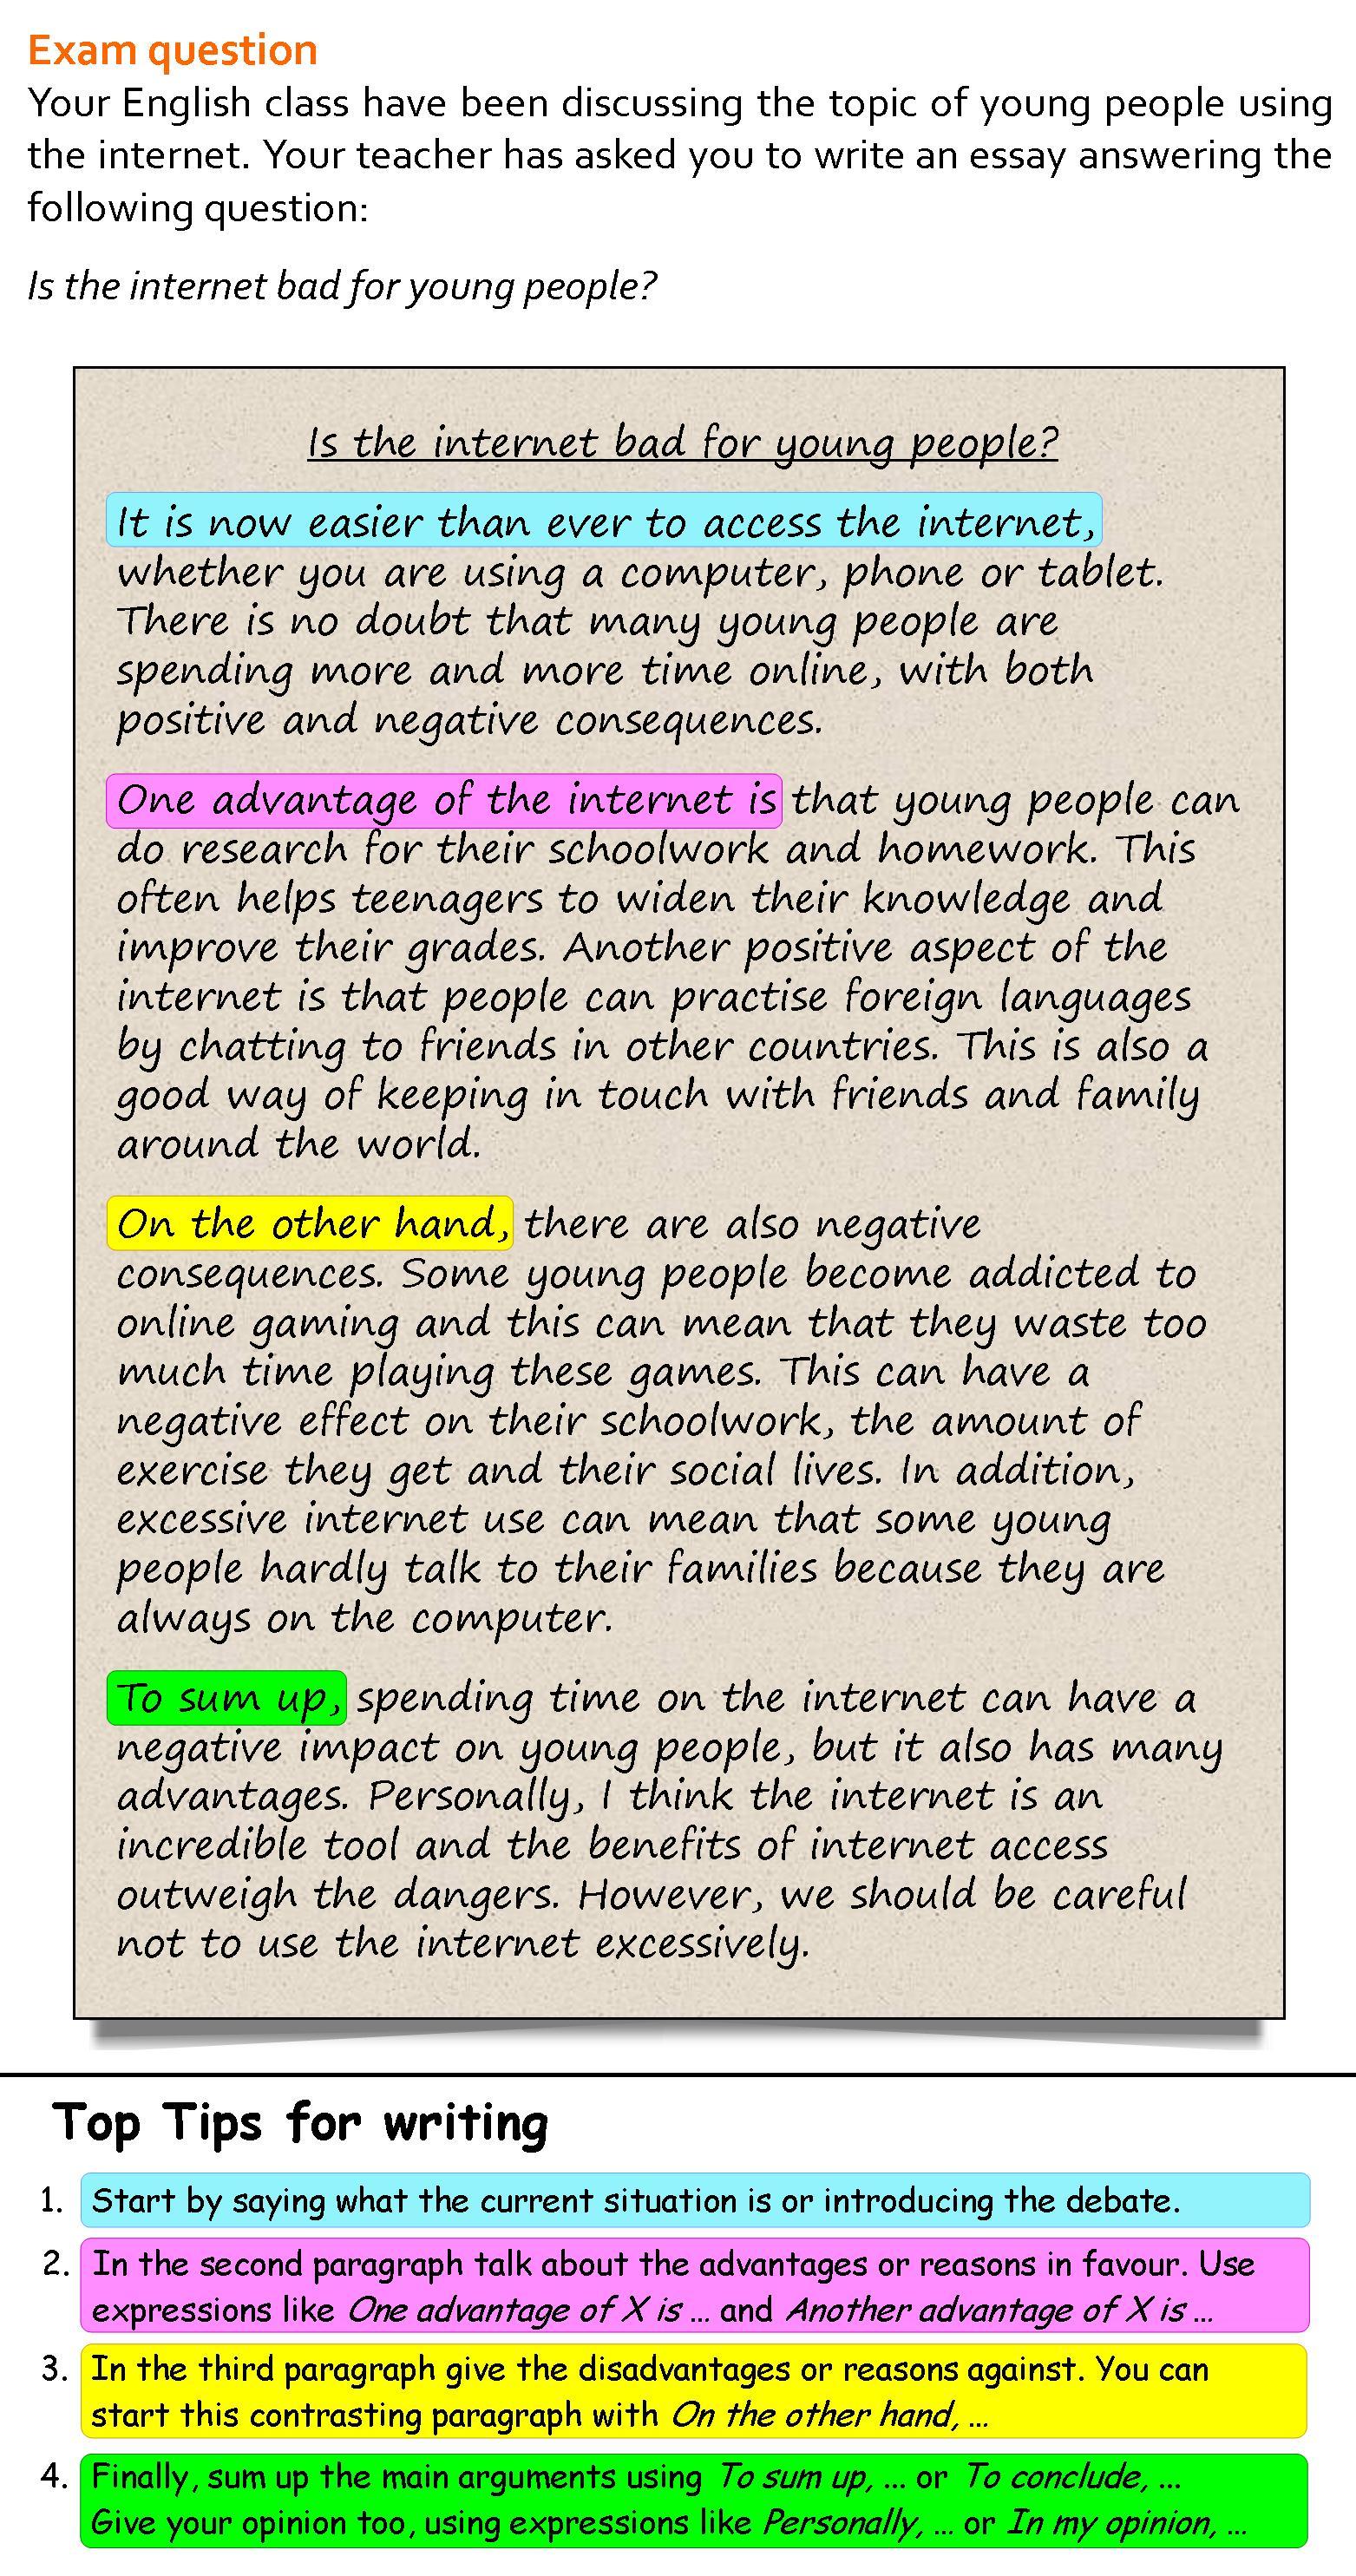 011 B2w A For And Against Essay 0 Internet Addiction Dreaded In Hindi Urdu 200 Words Full